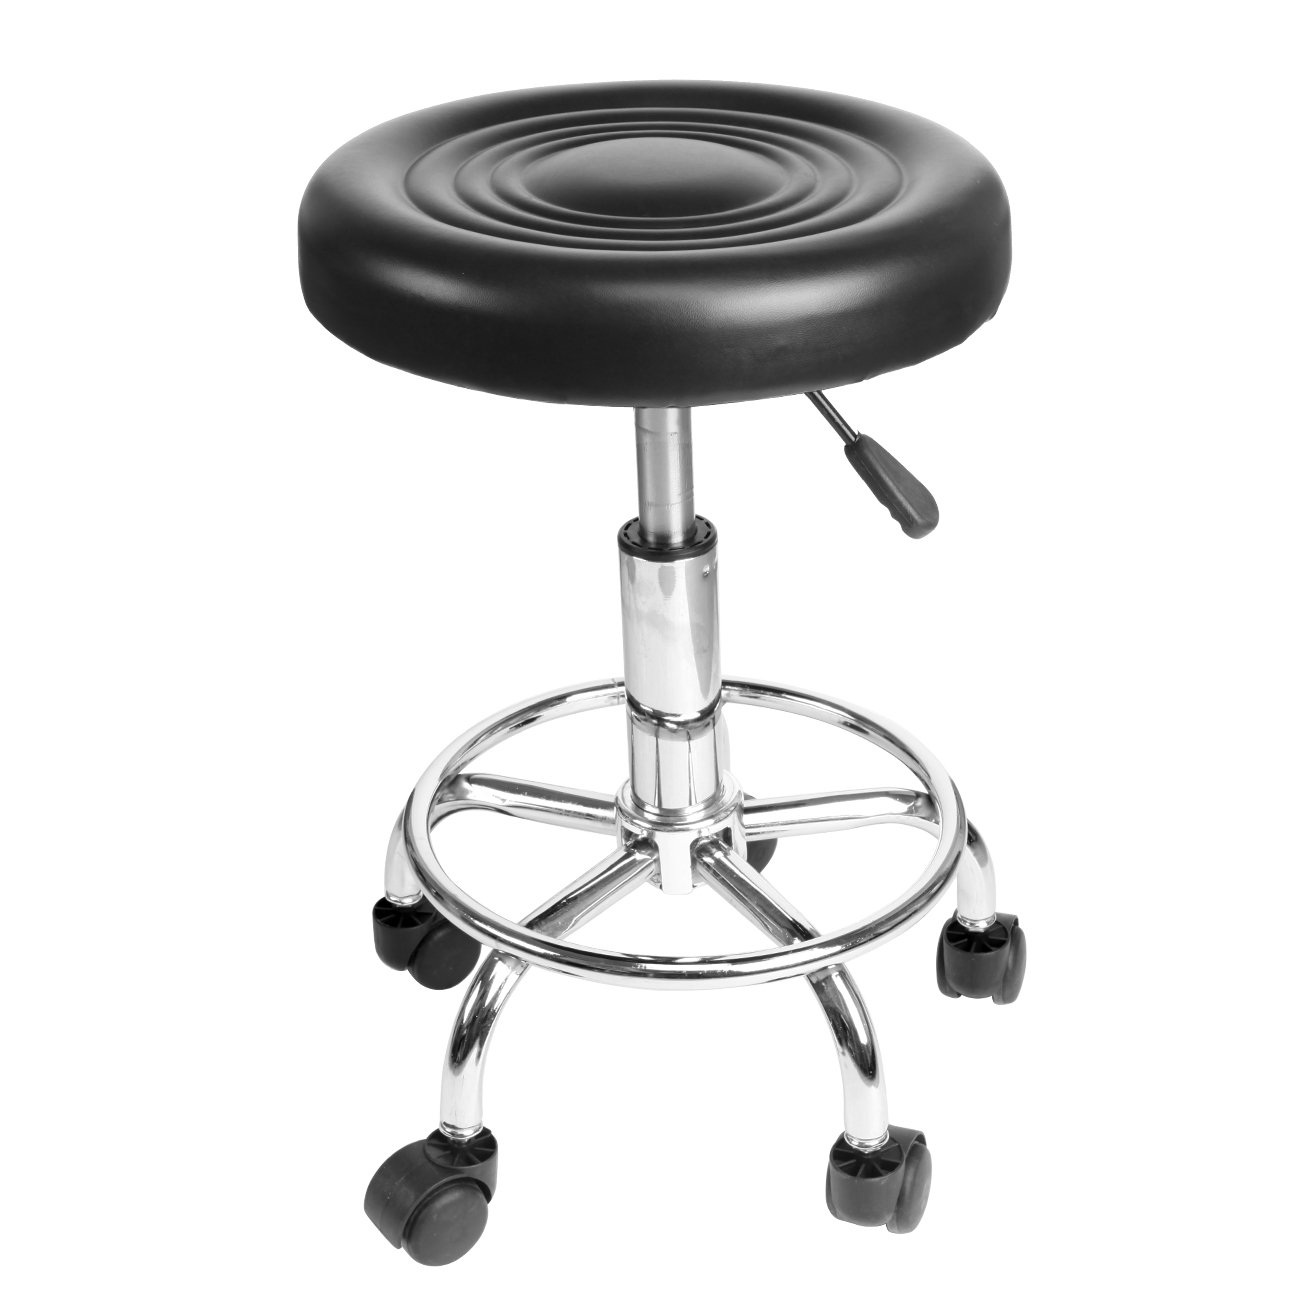 Ridgeyard Relief Hydraulic Salon Spa Drafting Stool Chair with Wheels Massage Swivel Chair Barber Seat (Black)